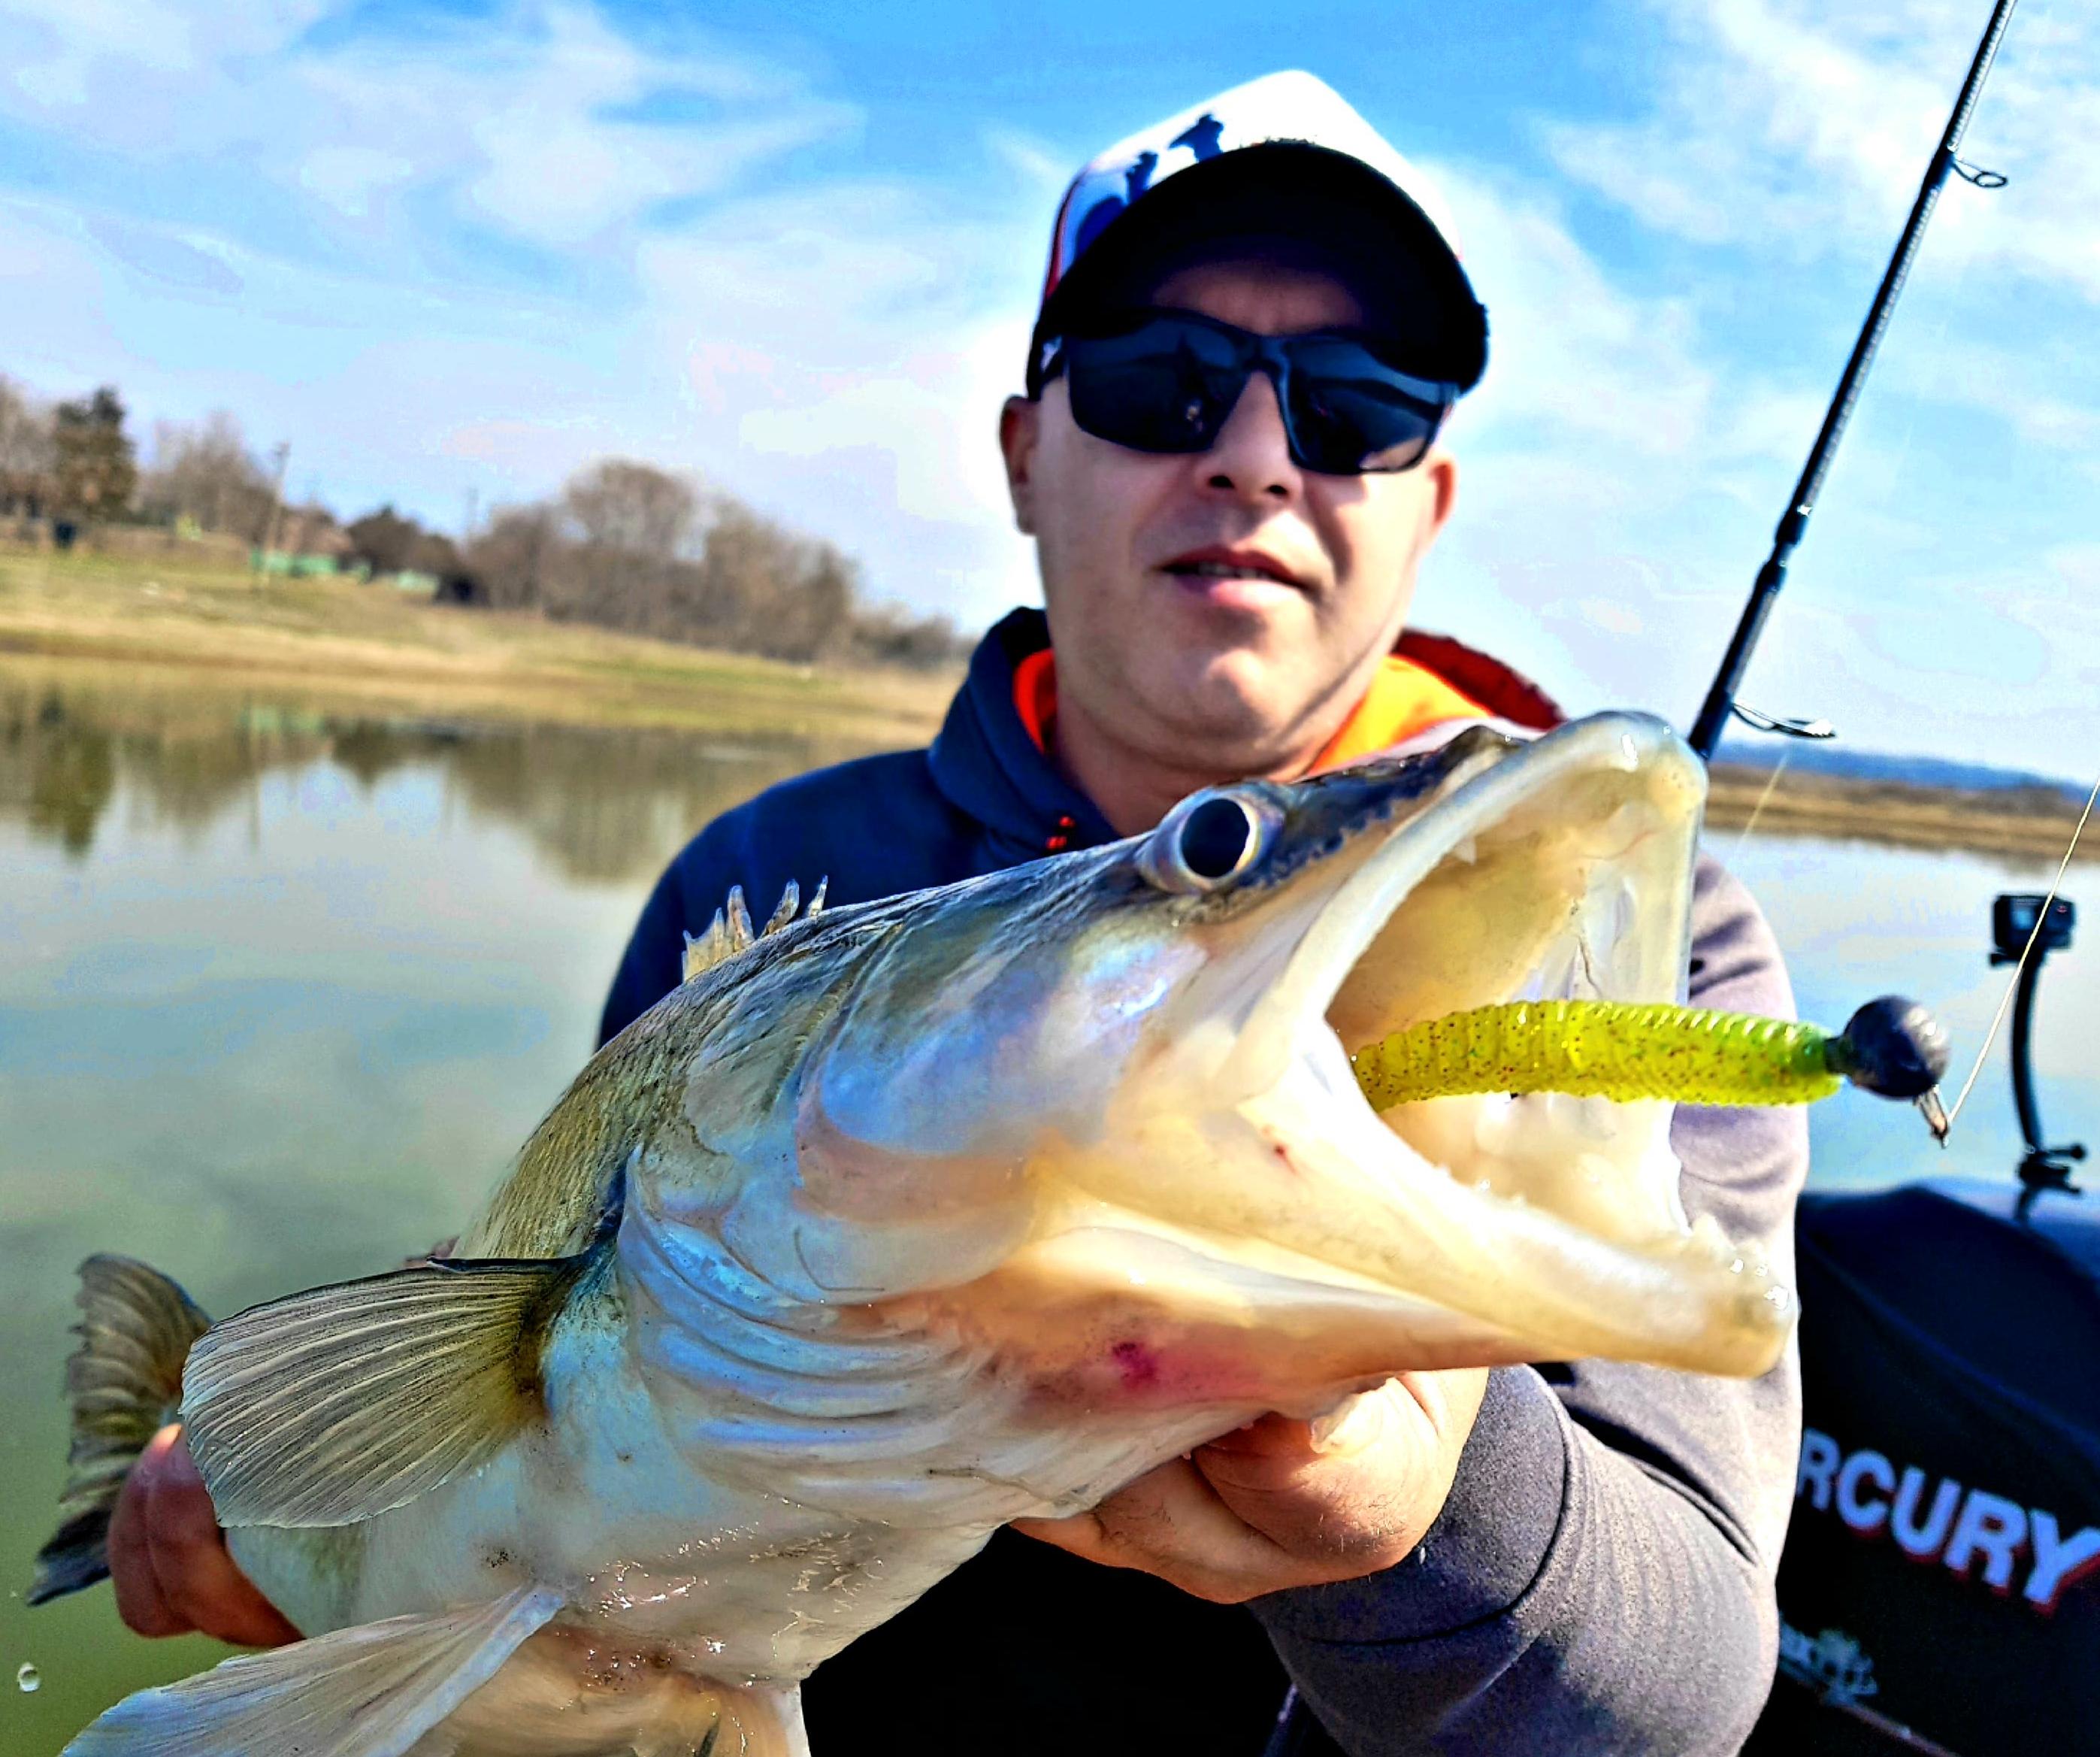 Primele partide de pescuit la salau 2018